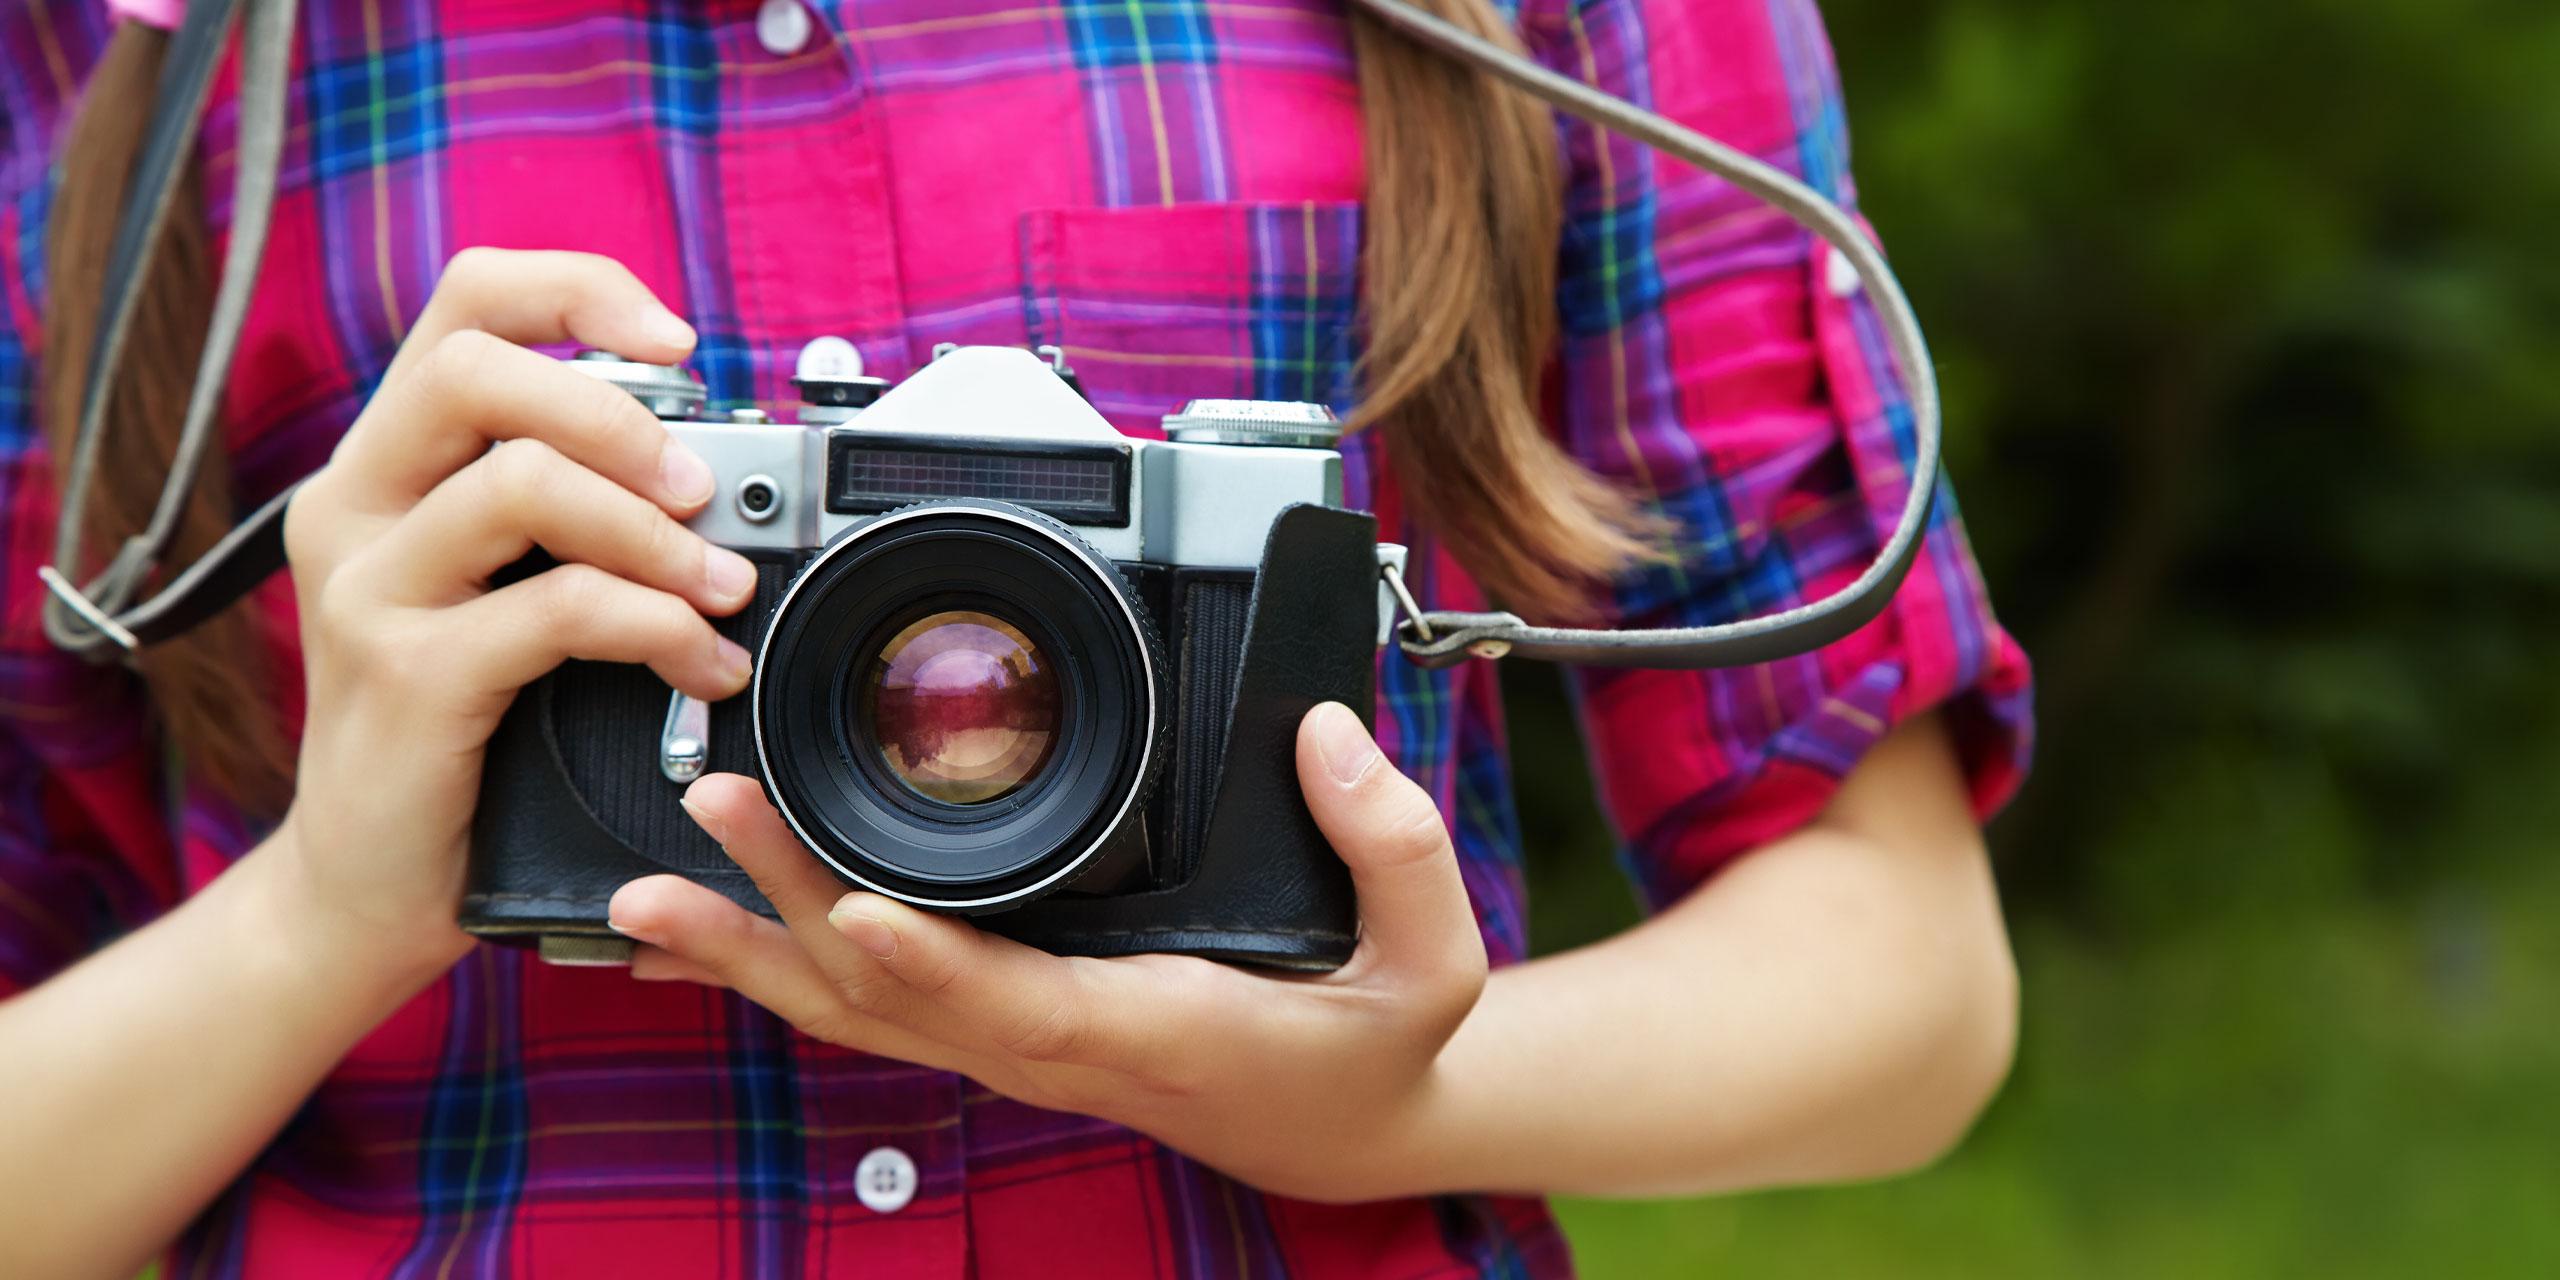 Best cam sites for cam girls